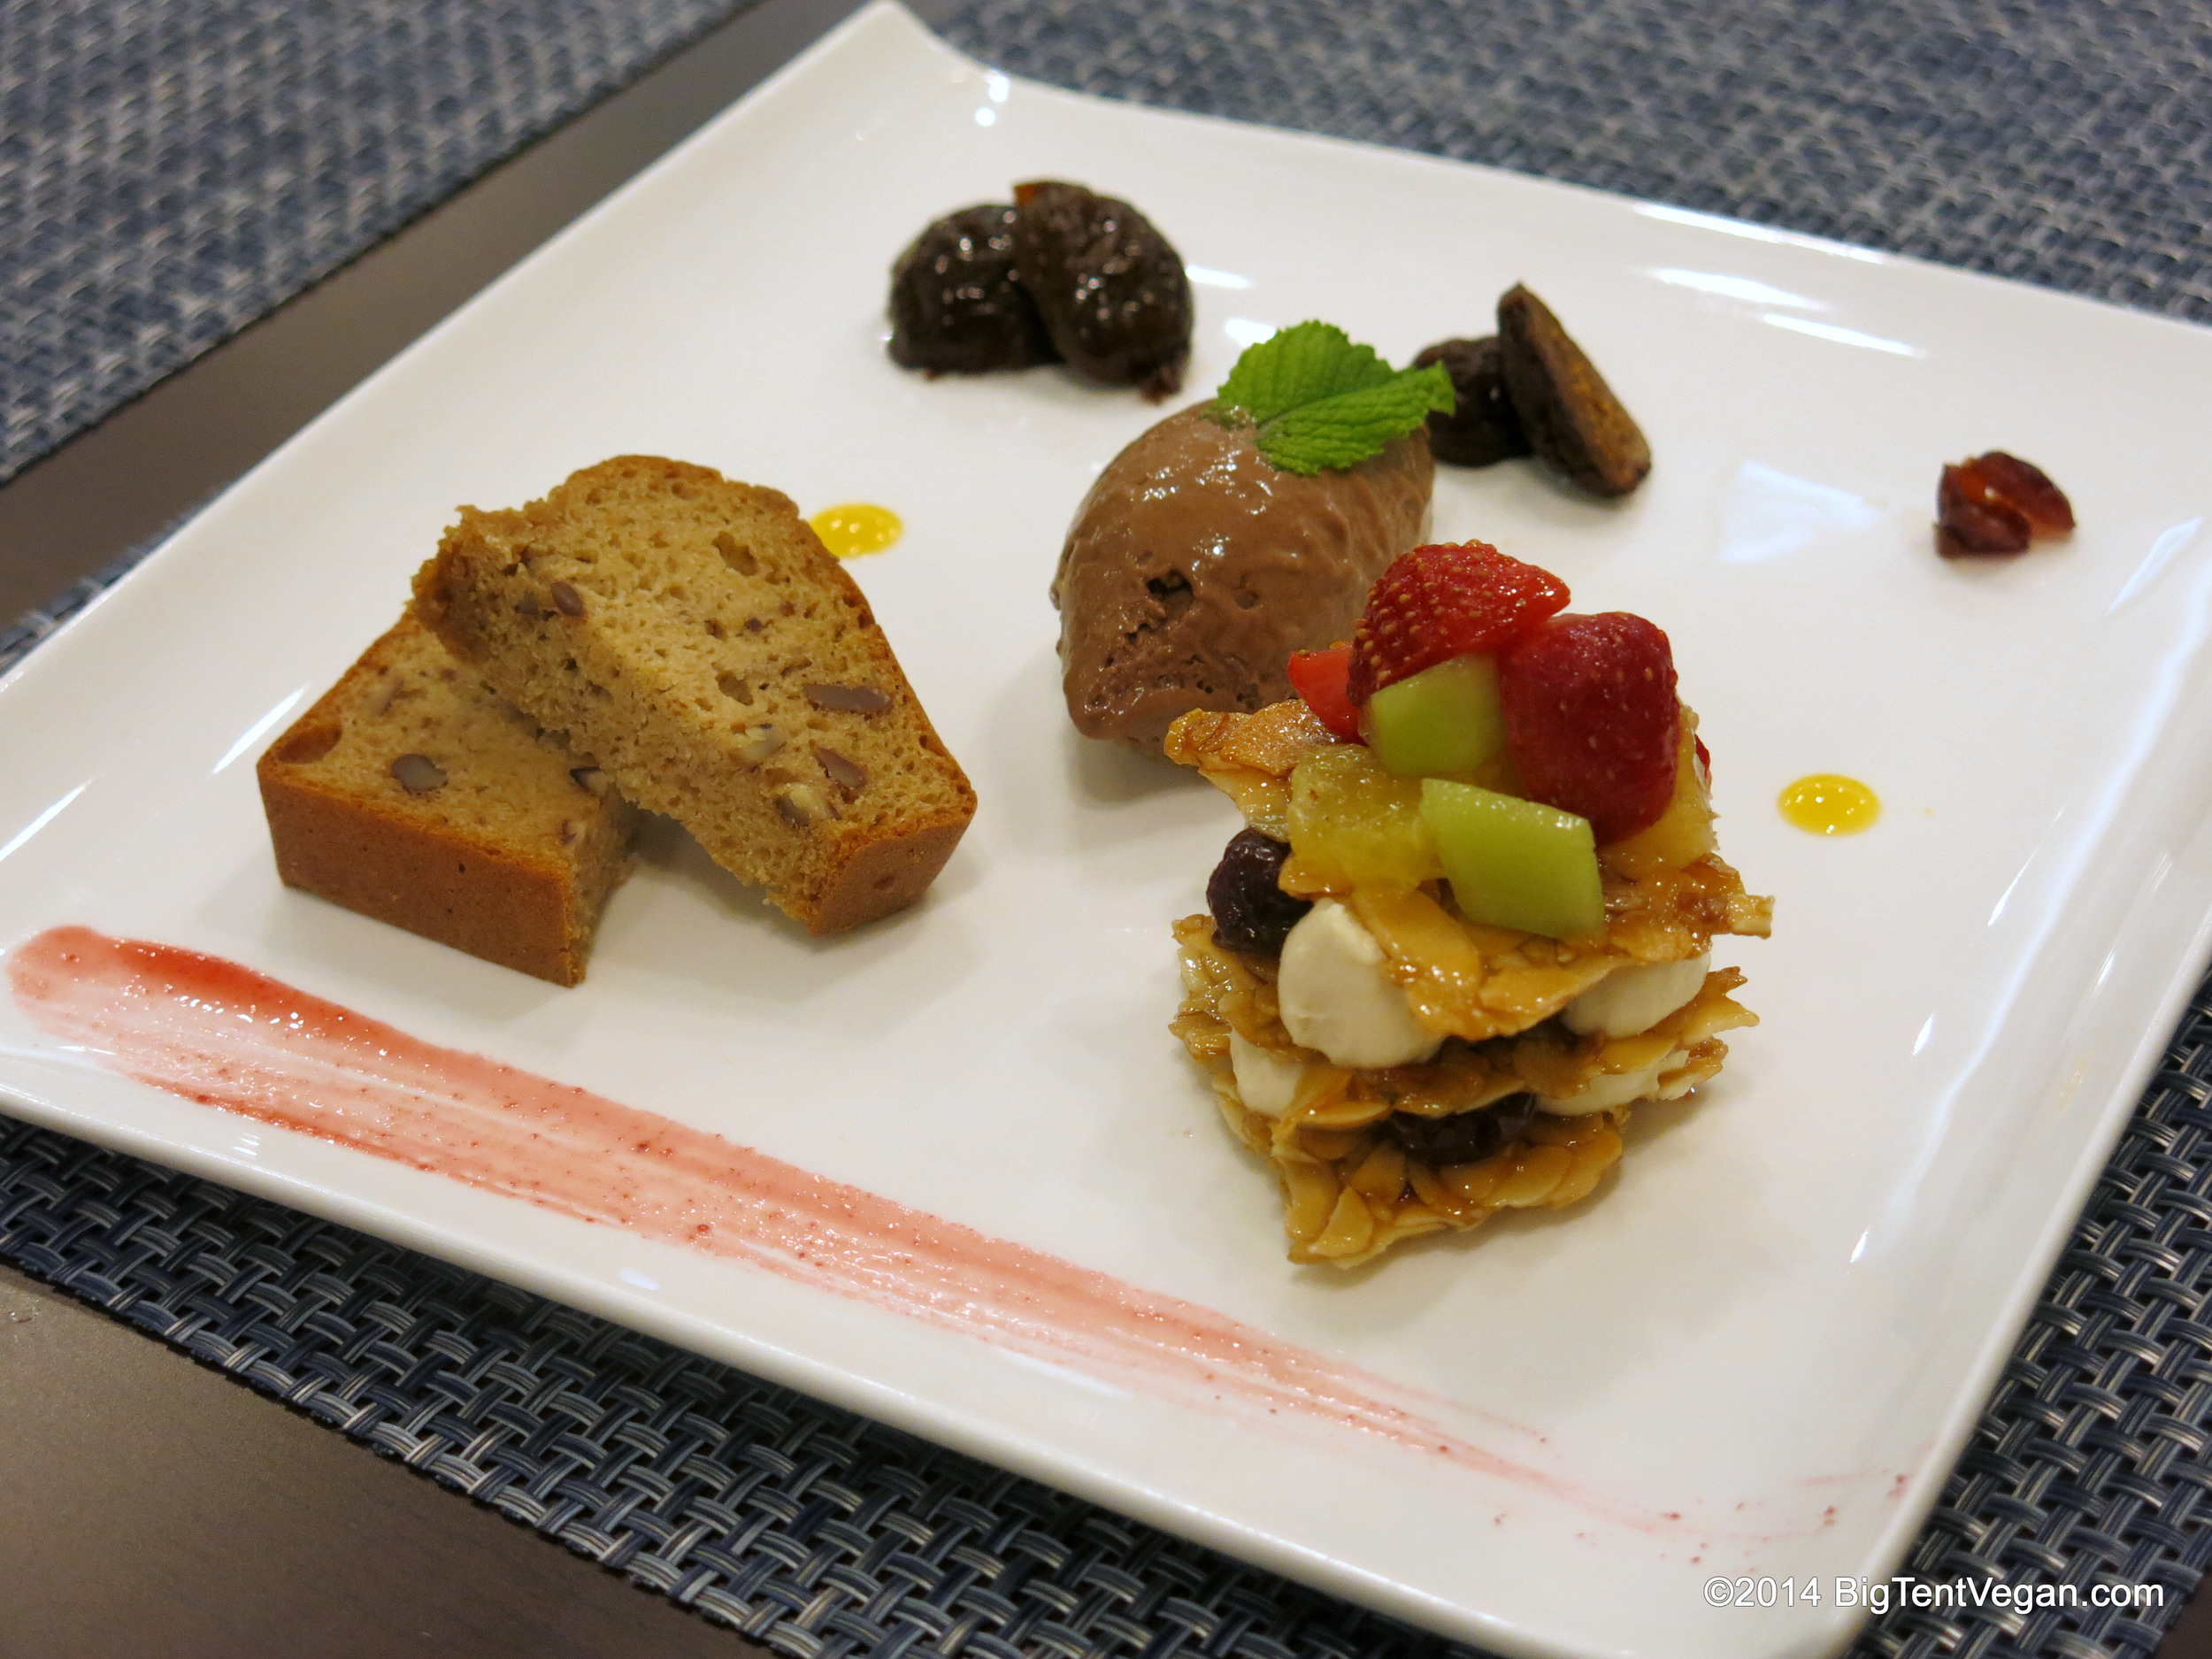 Assortment of Desserts and Fruits (part of set dinner menu)